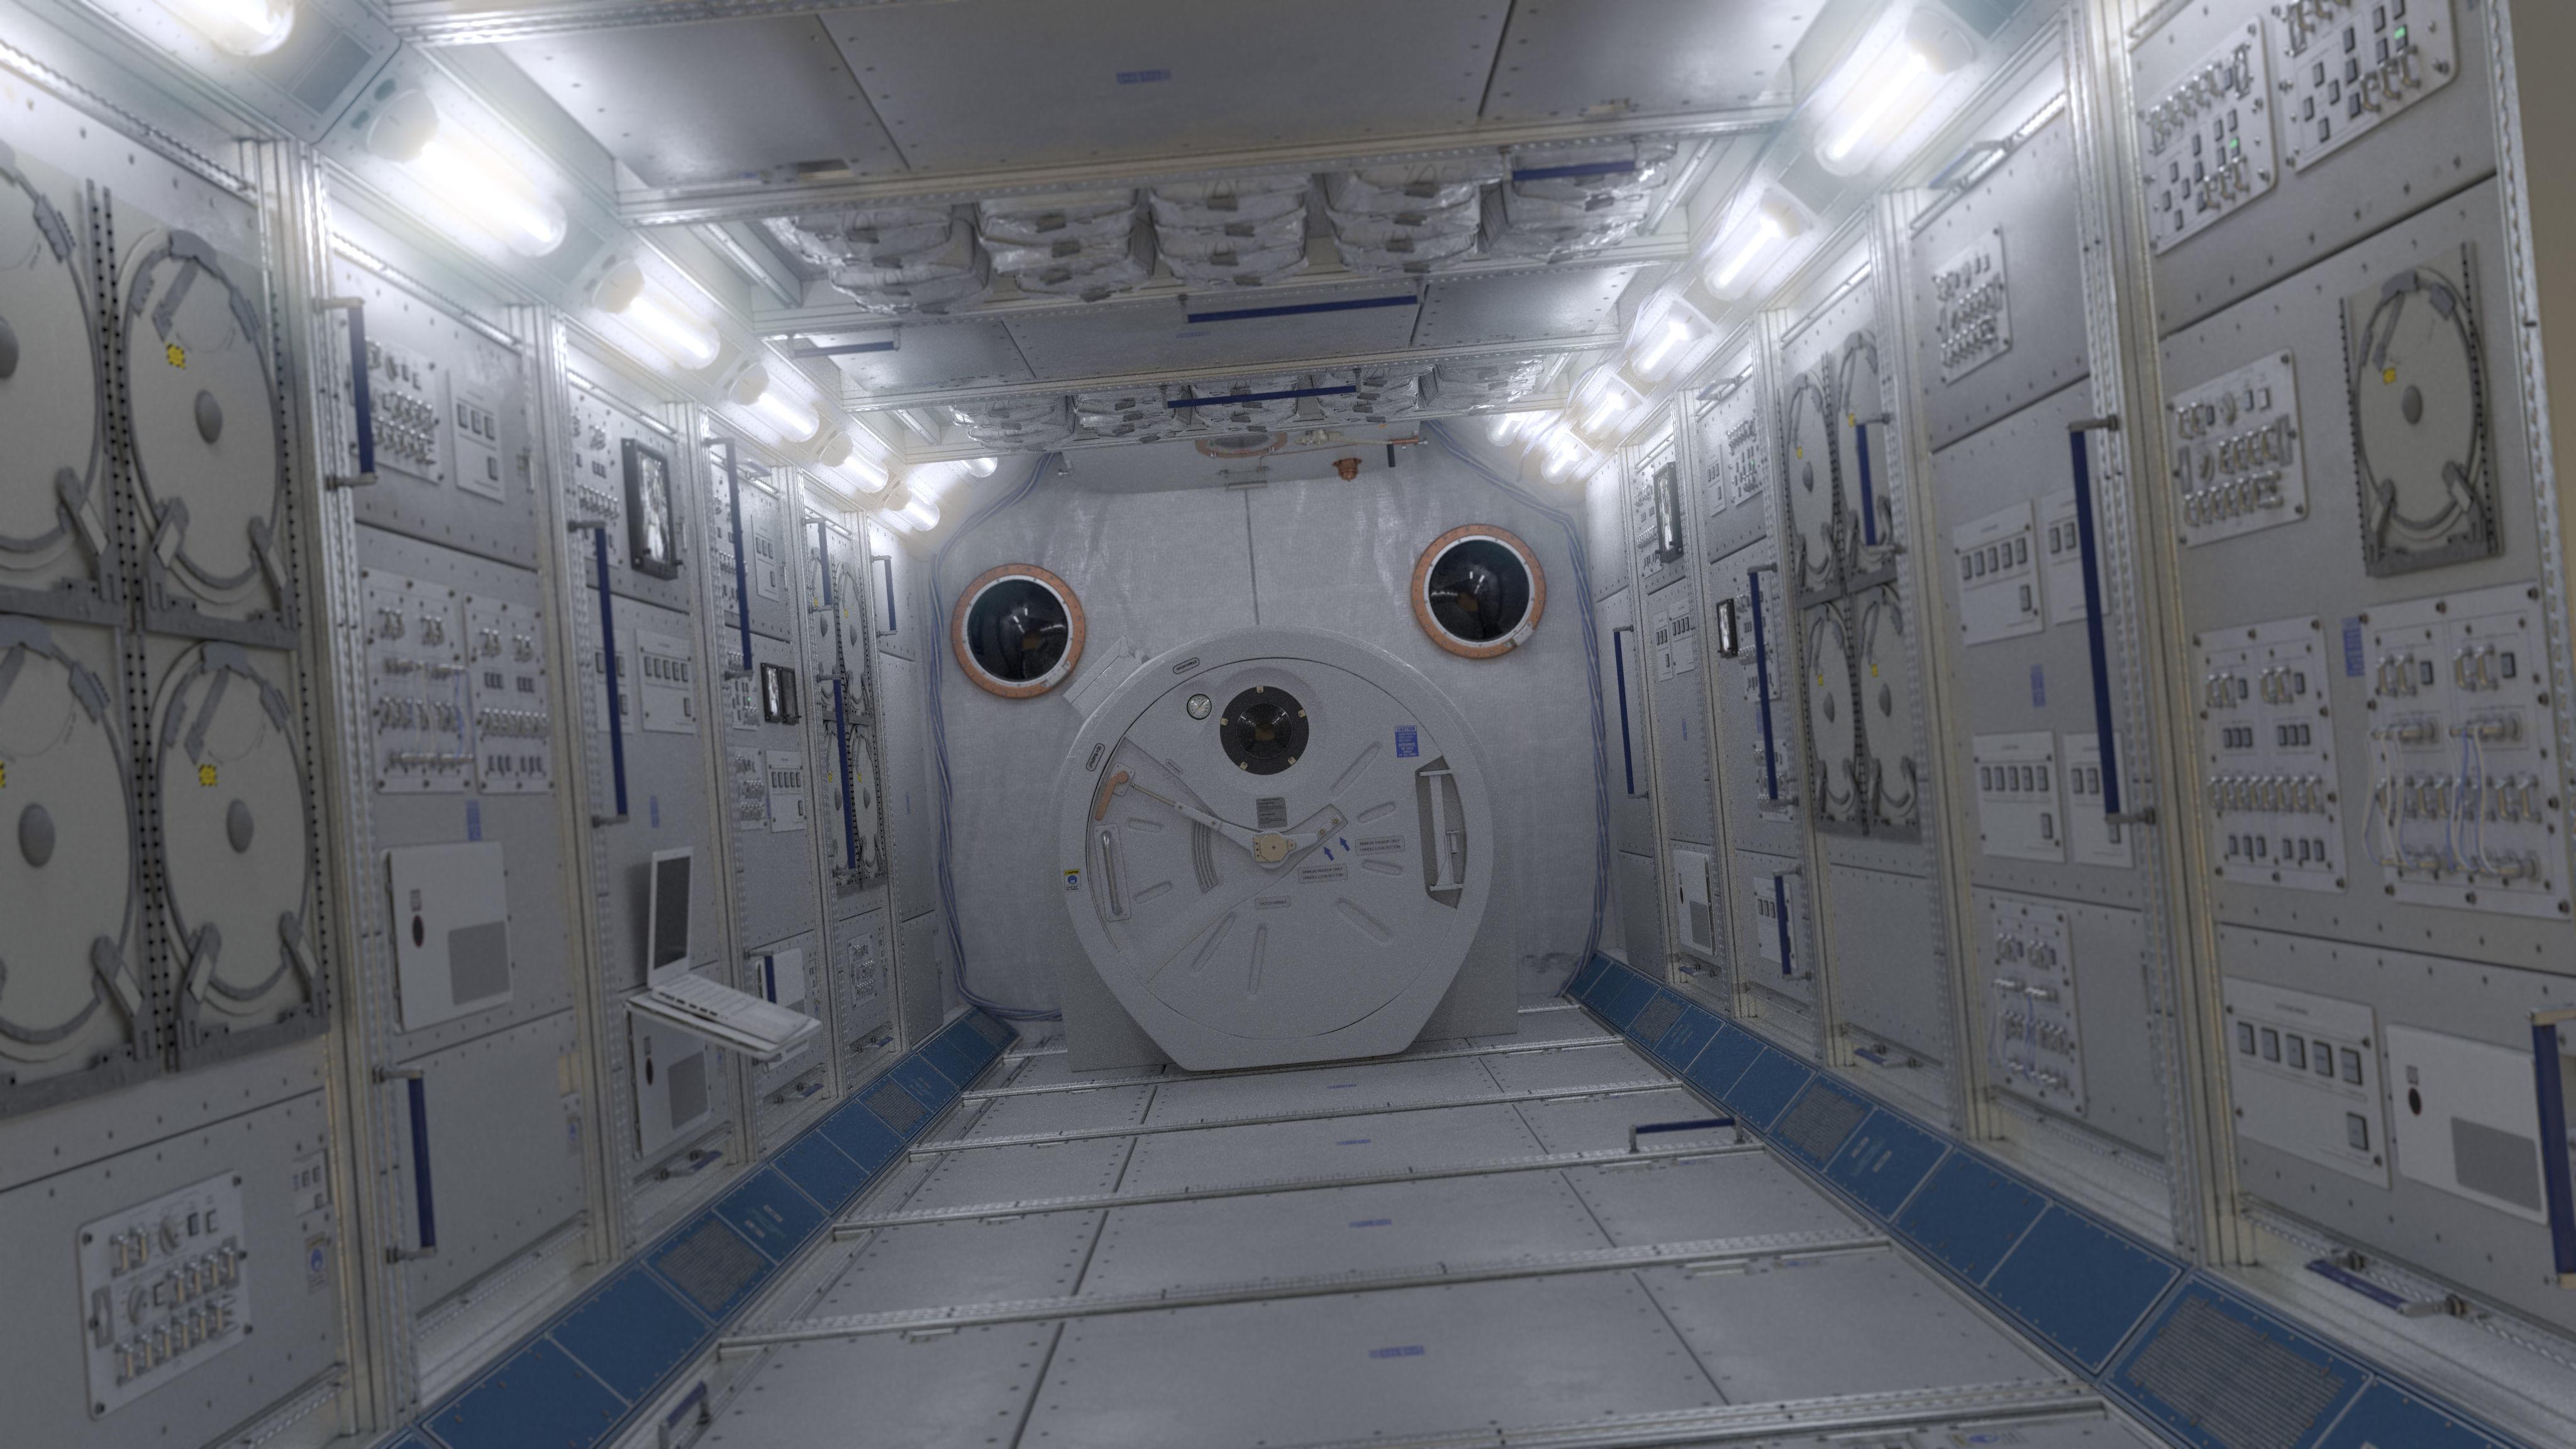 ISS Spaceship Interior